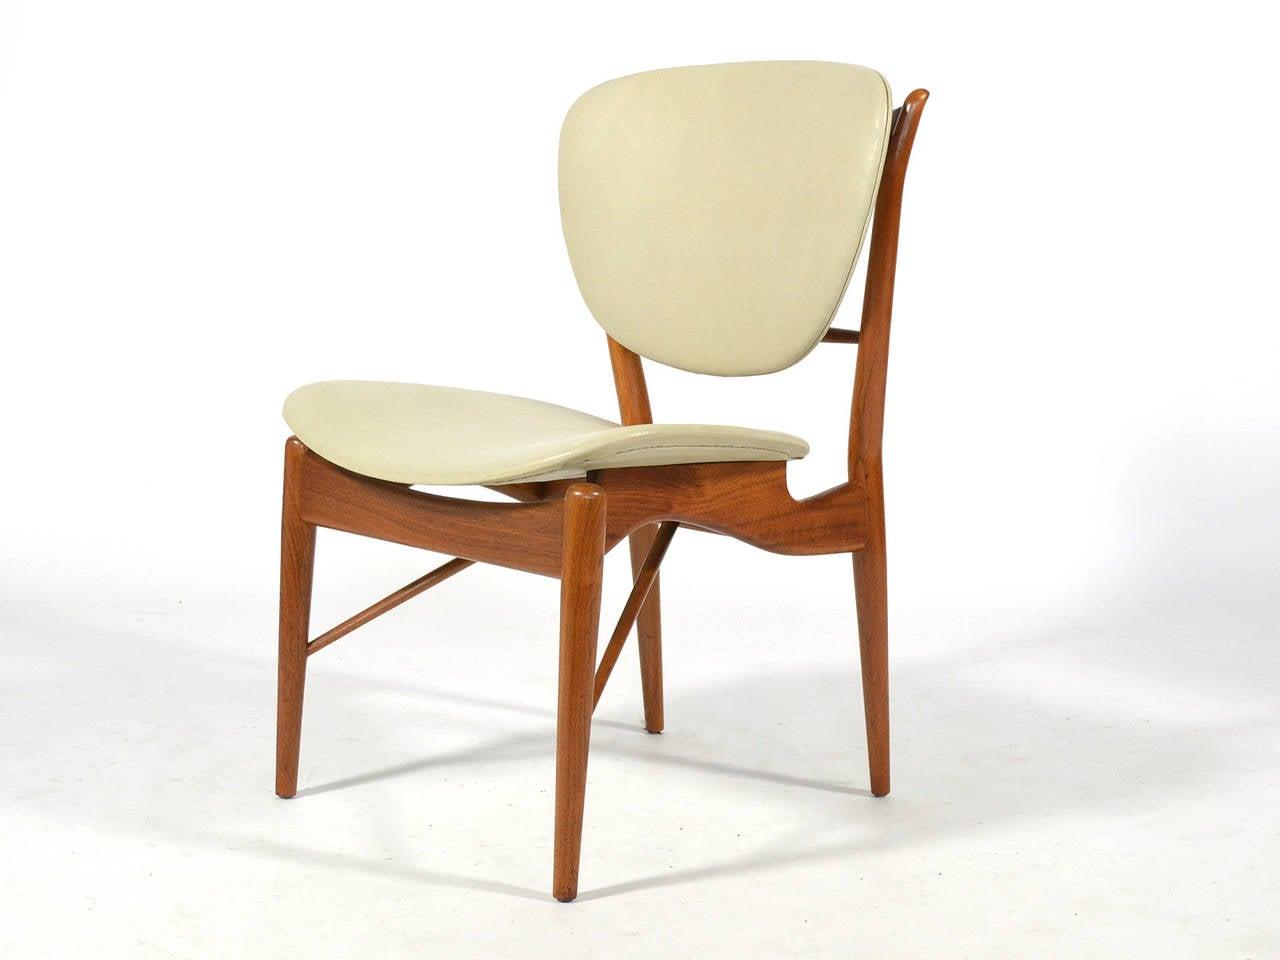 Naugahyde Finn Juhl Dining Table and Chairs For Sale